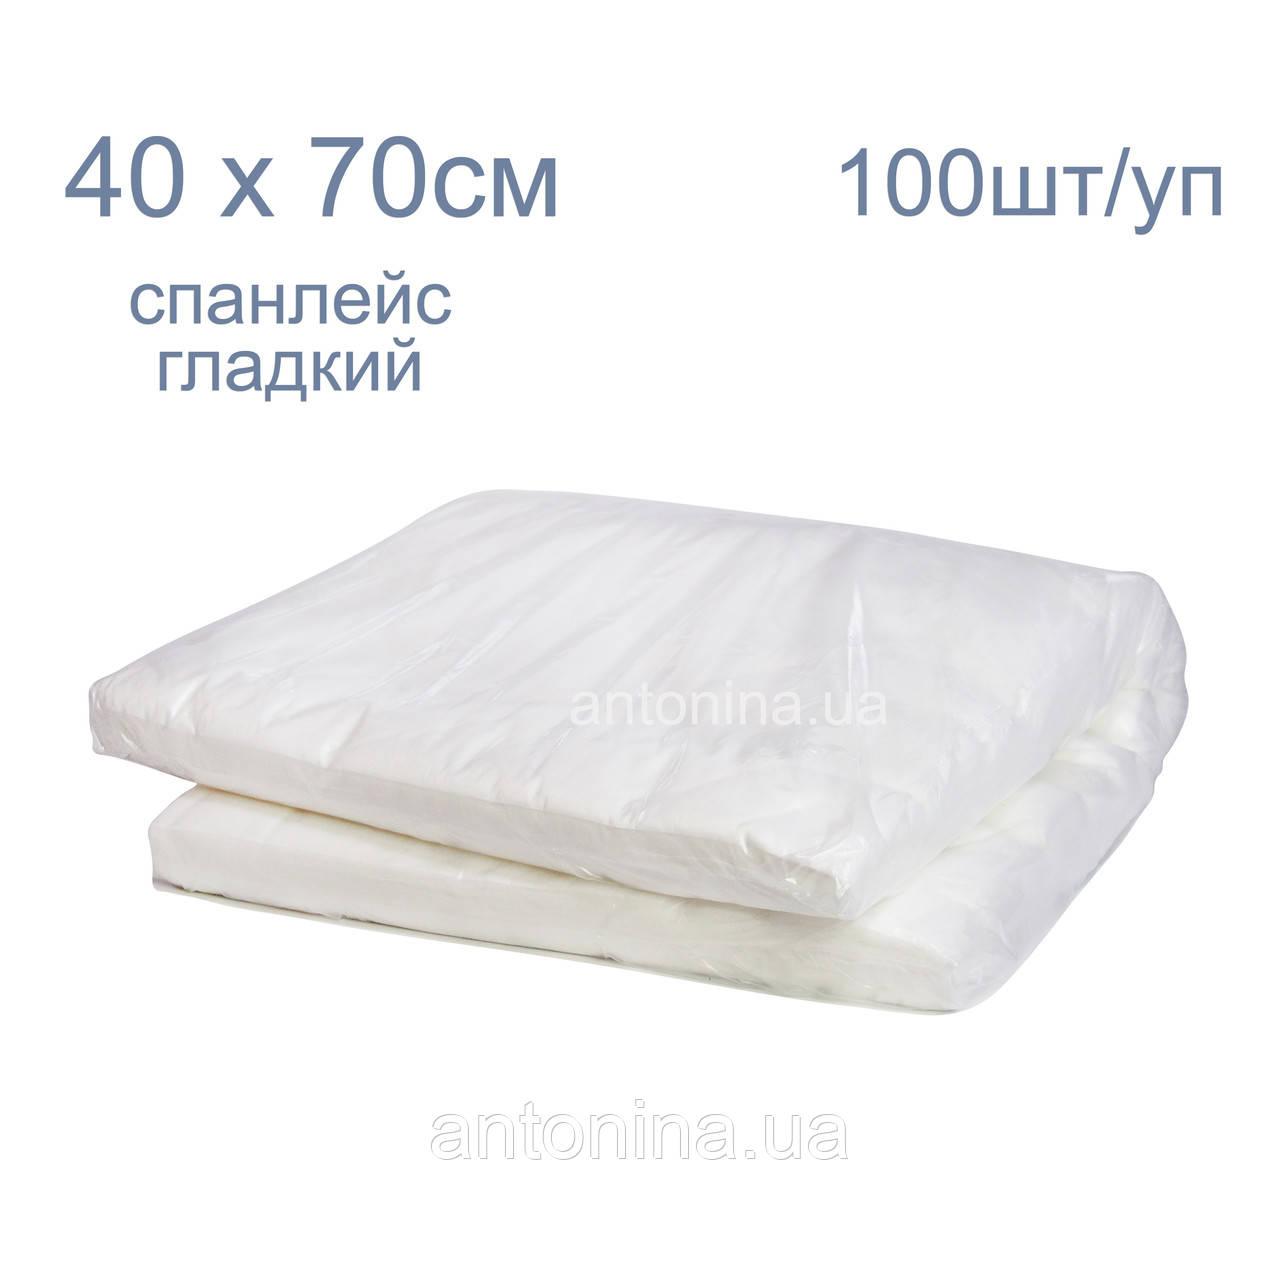 Рушник 40х70см, спанлейс гладкий, 100 шт/уп